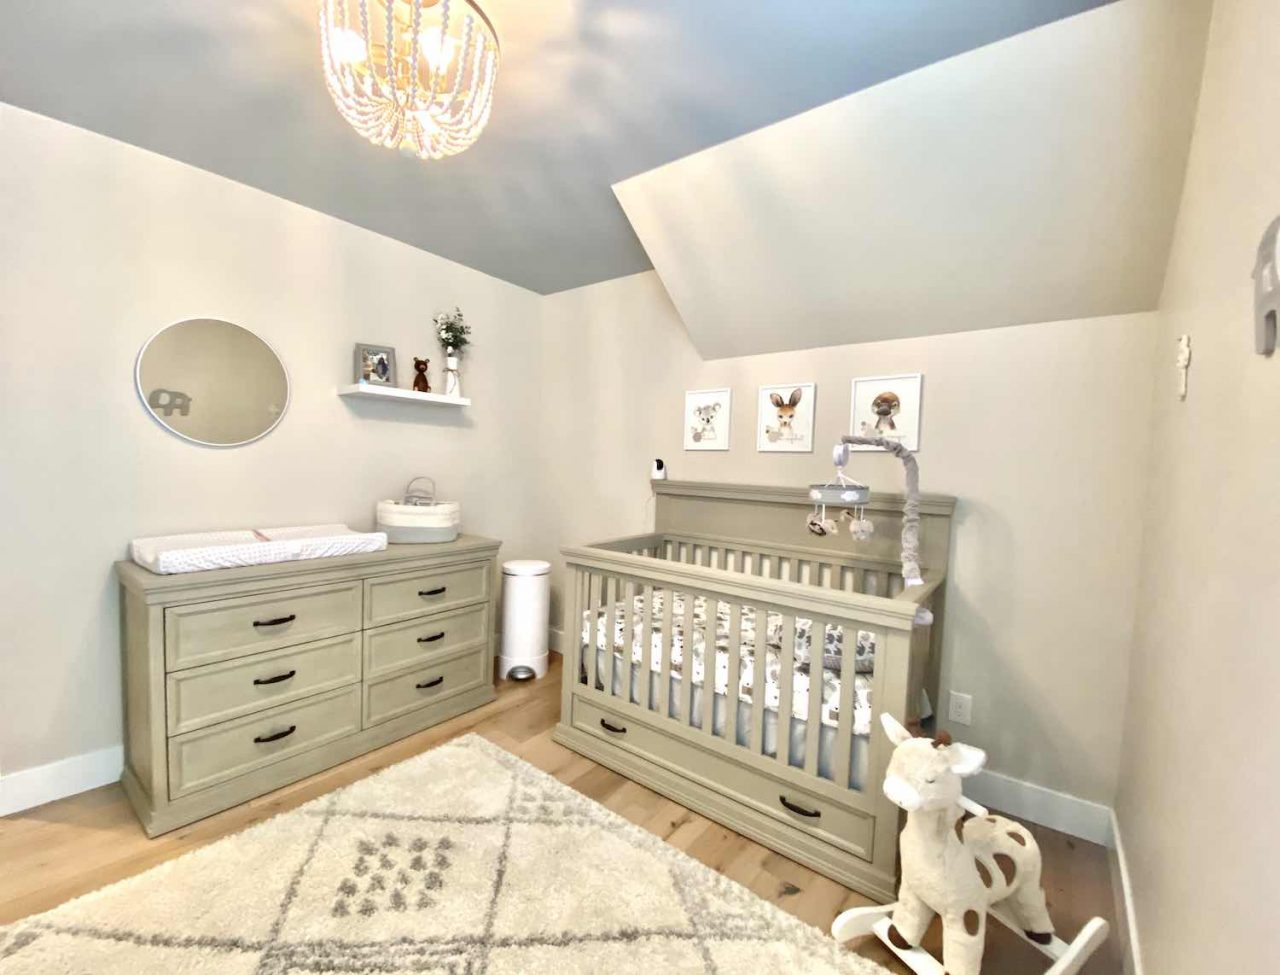 grey hardwood flooring in a nursery